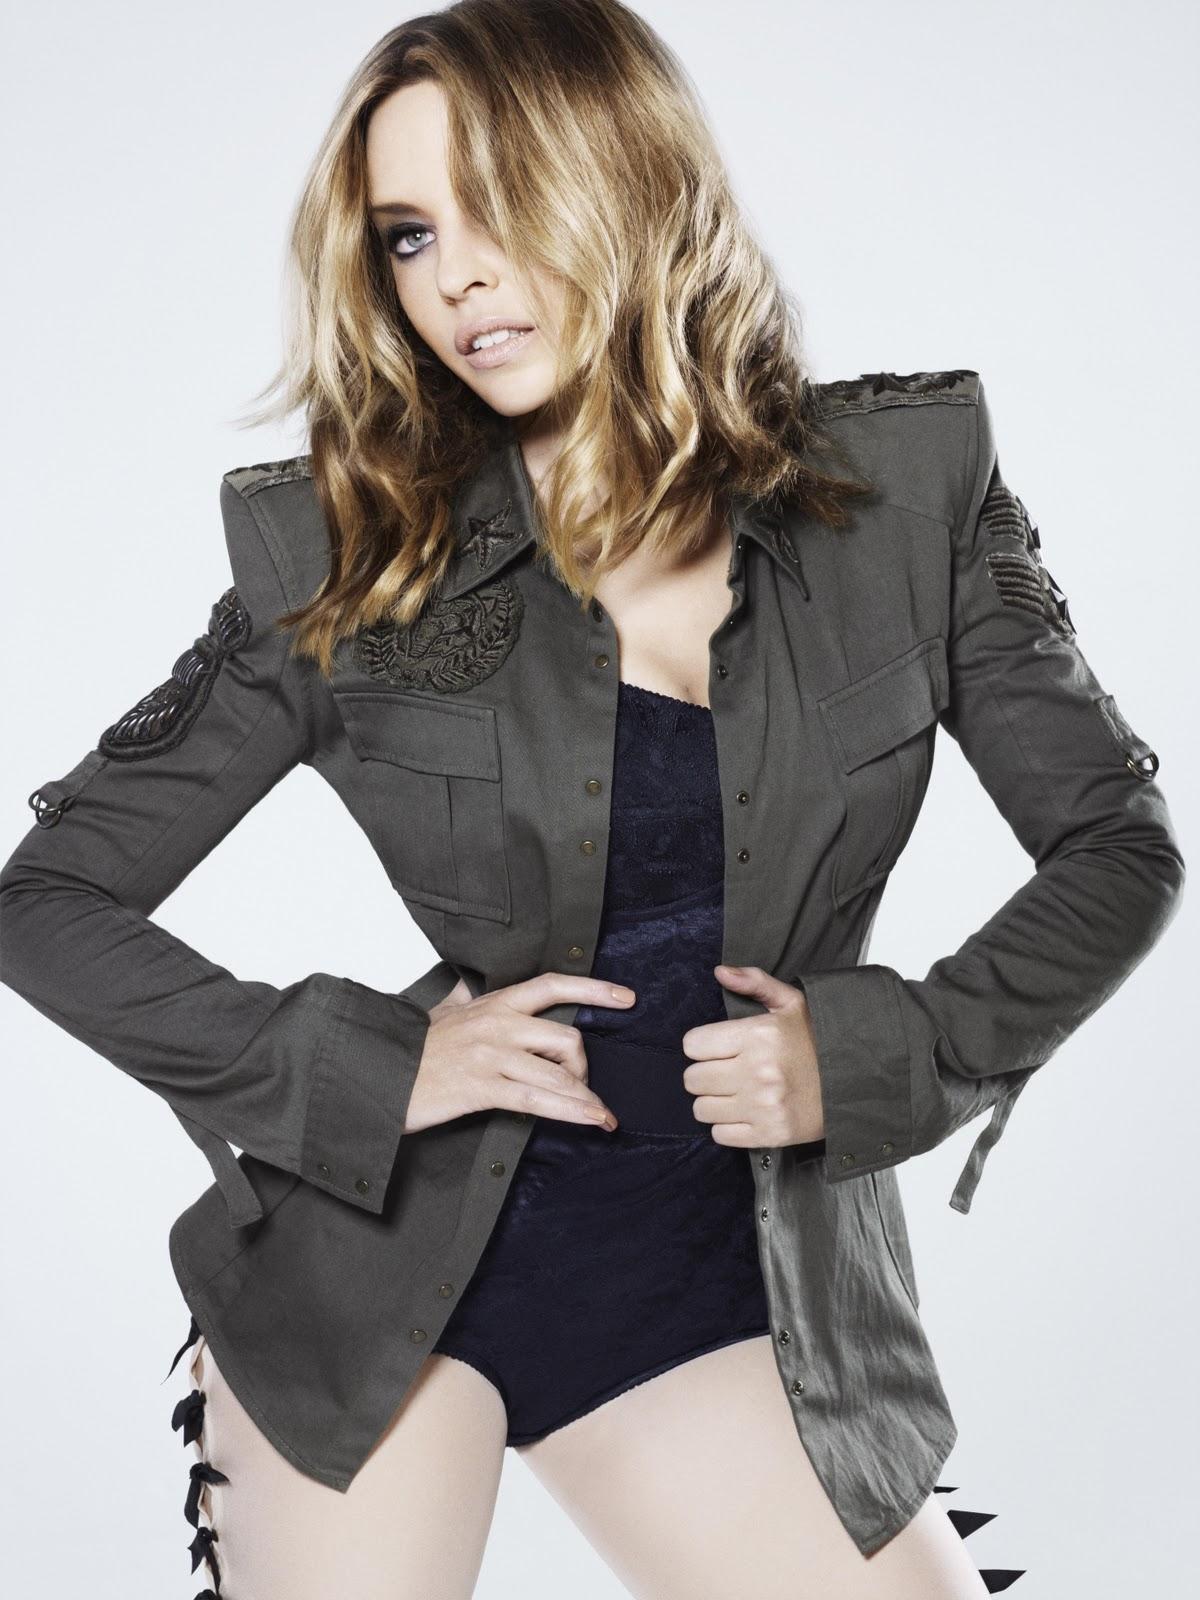 http://1.bp.blogspot.com/_c6MC1HN_BoI/TLCisrK4rhI/AAAAAAAAAPM/rlPqQfbLoV0/s1600/Kylie+%2845%29.jpg